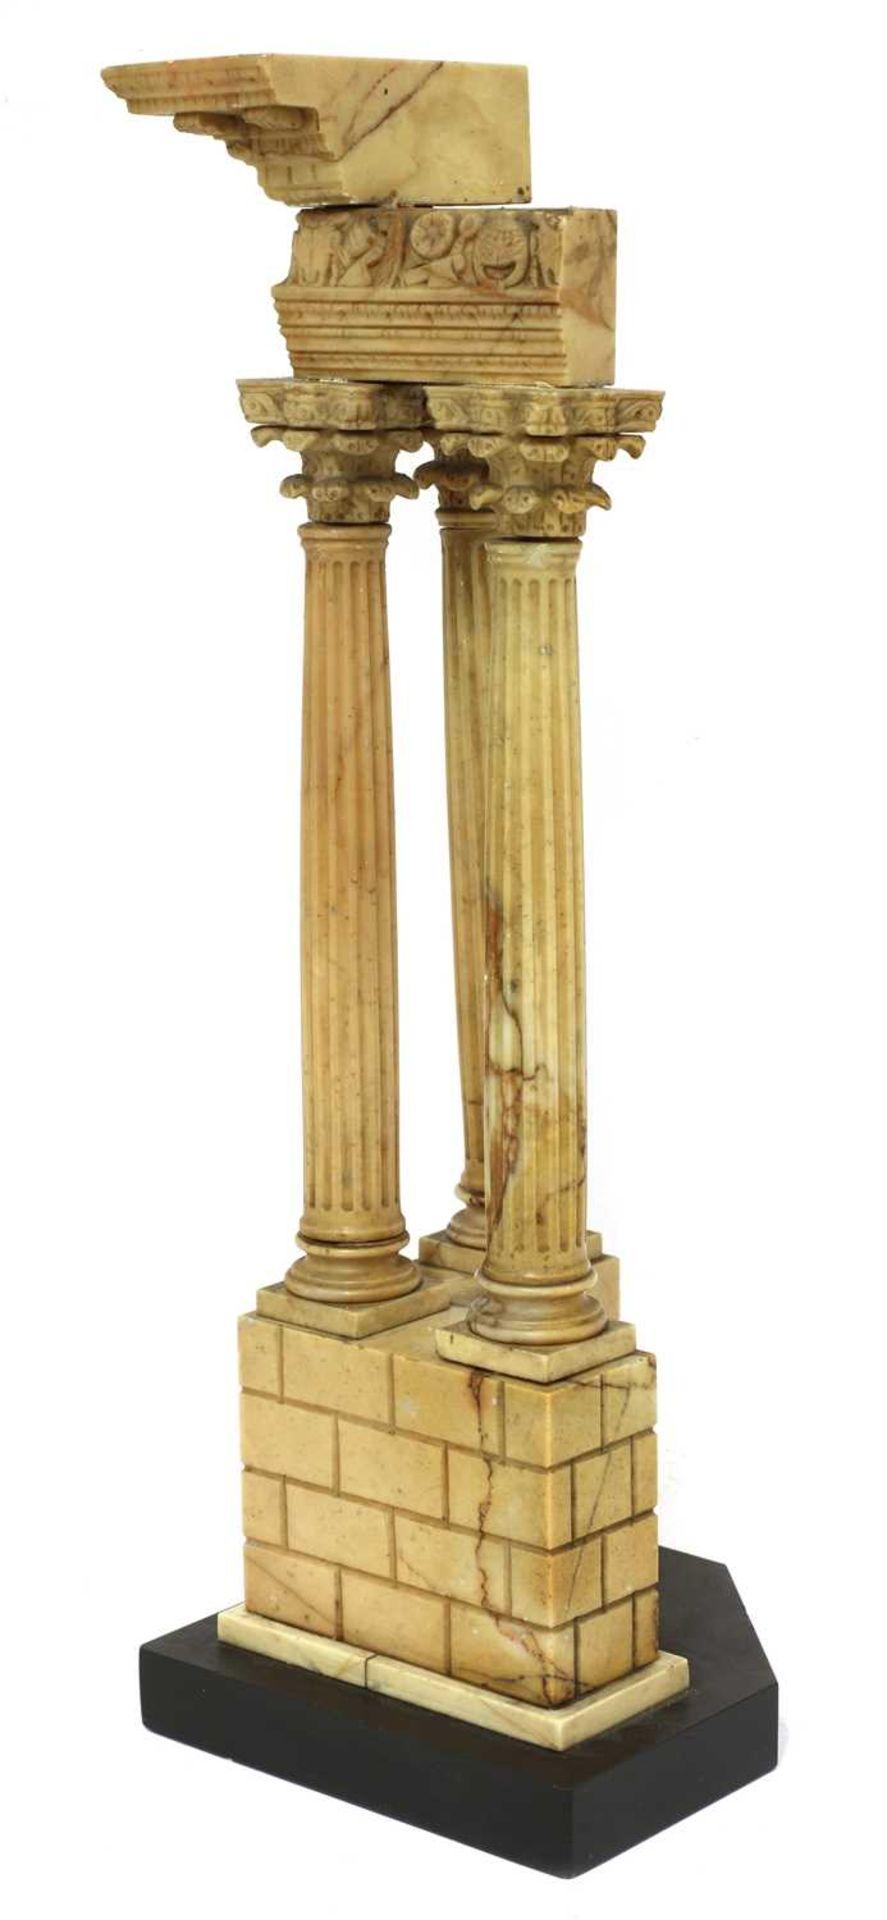 An Italian grand tour giallo antico marble souvenir, - Image 3 of 4